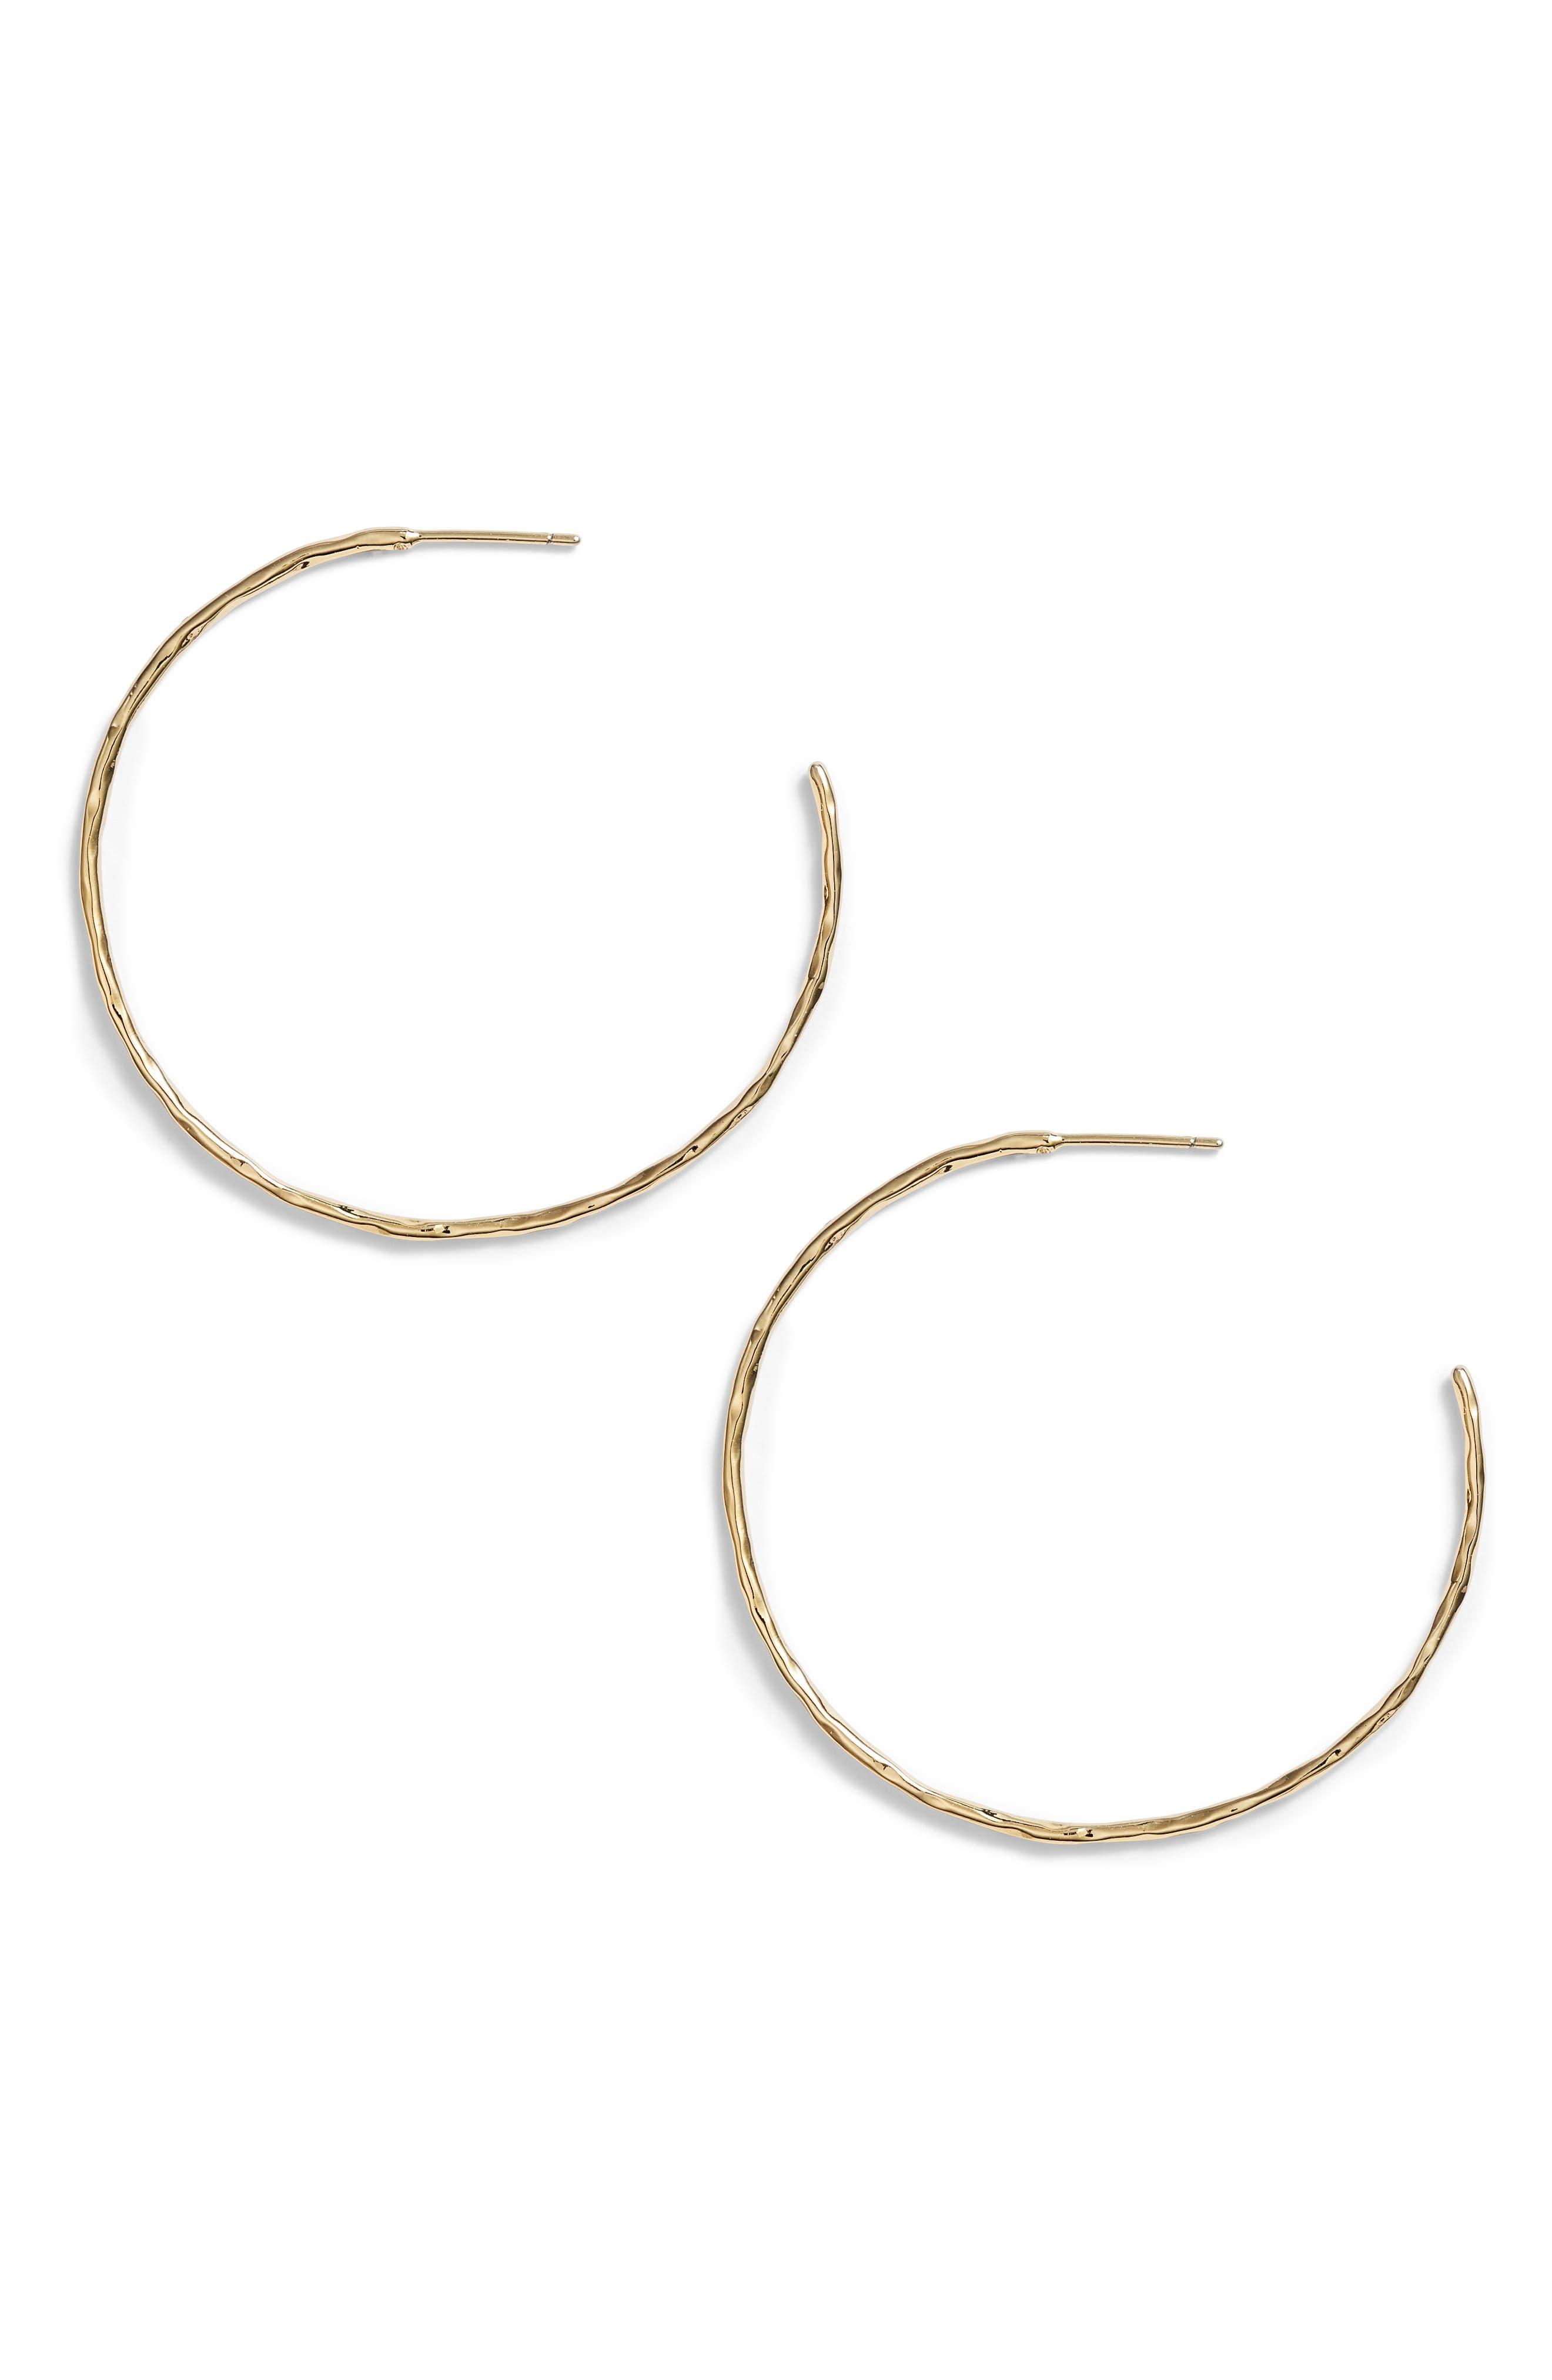 Taner Hoop Earrings,                             Main thumbnail 1, color,                             GOLD